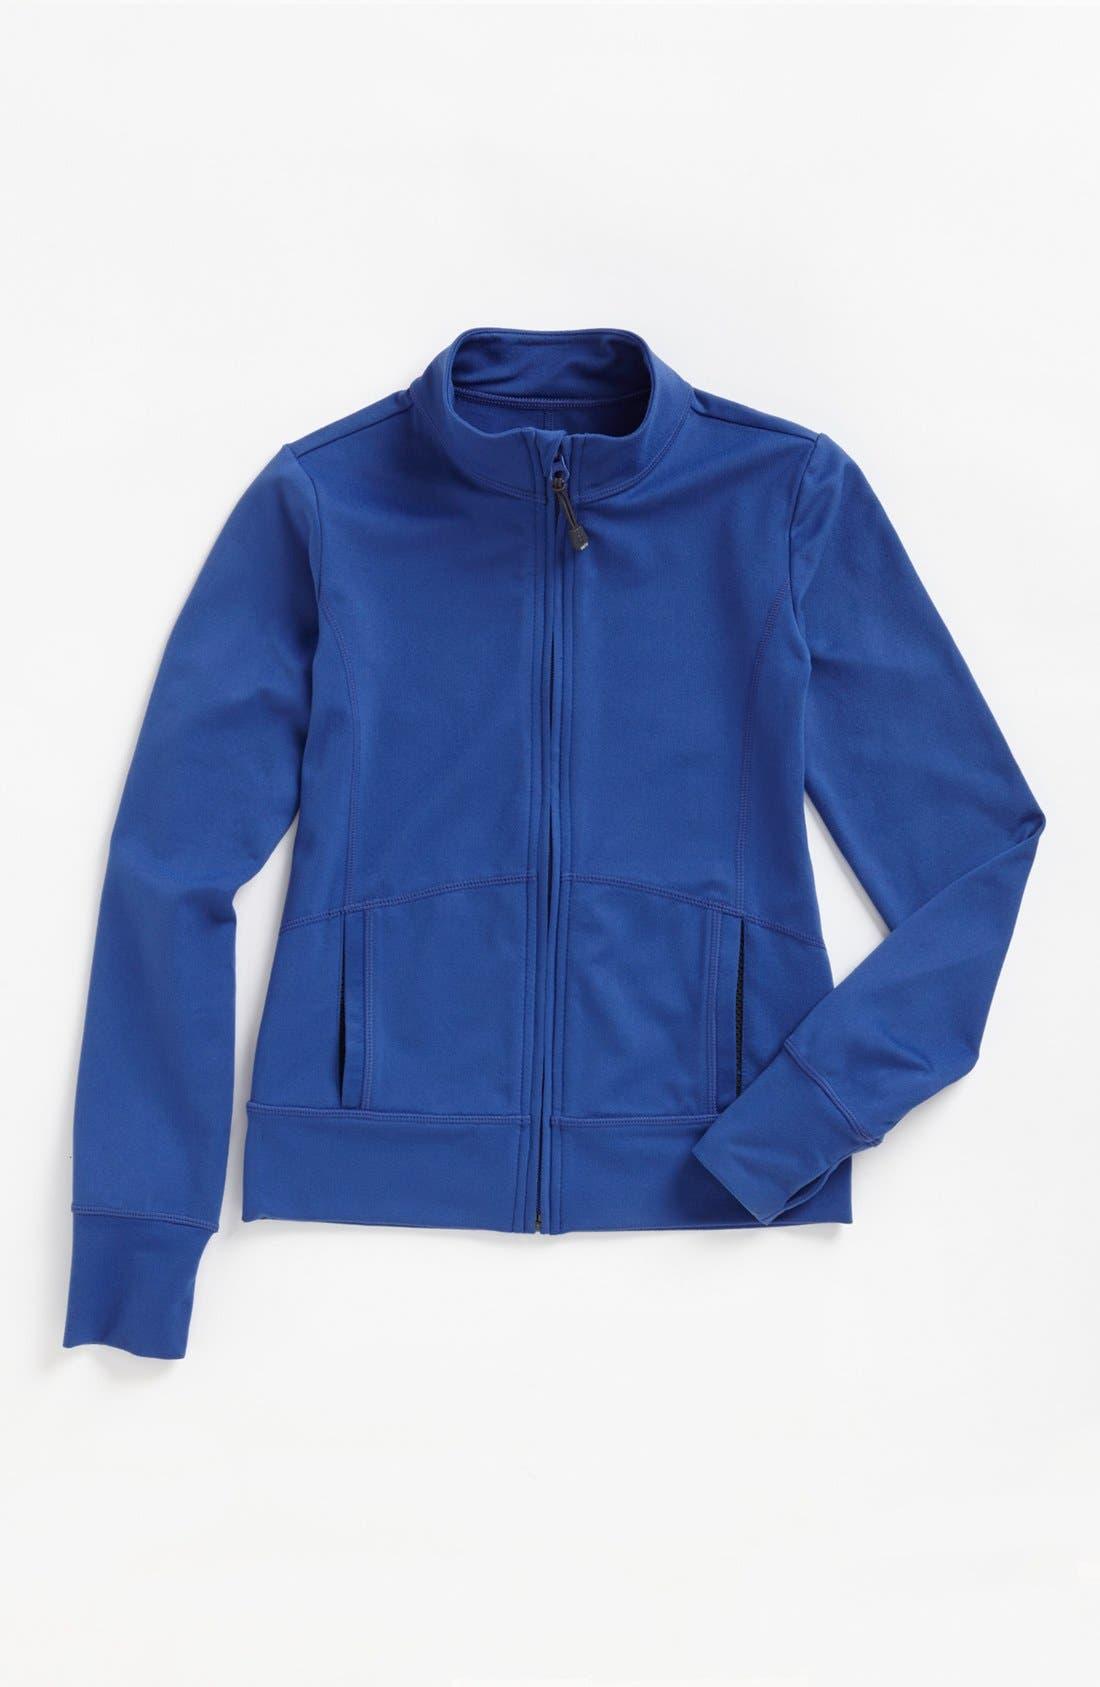 Main Image - Zella 'Everyday' Jacket (Little Girls & Big Girls)